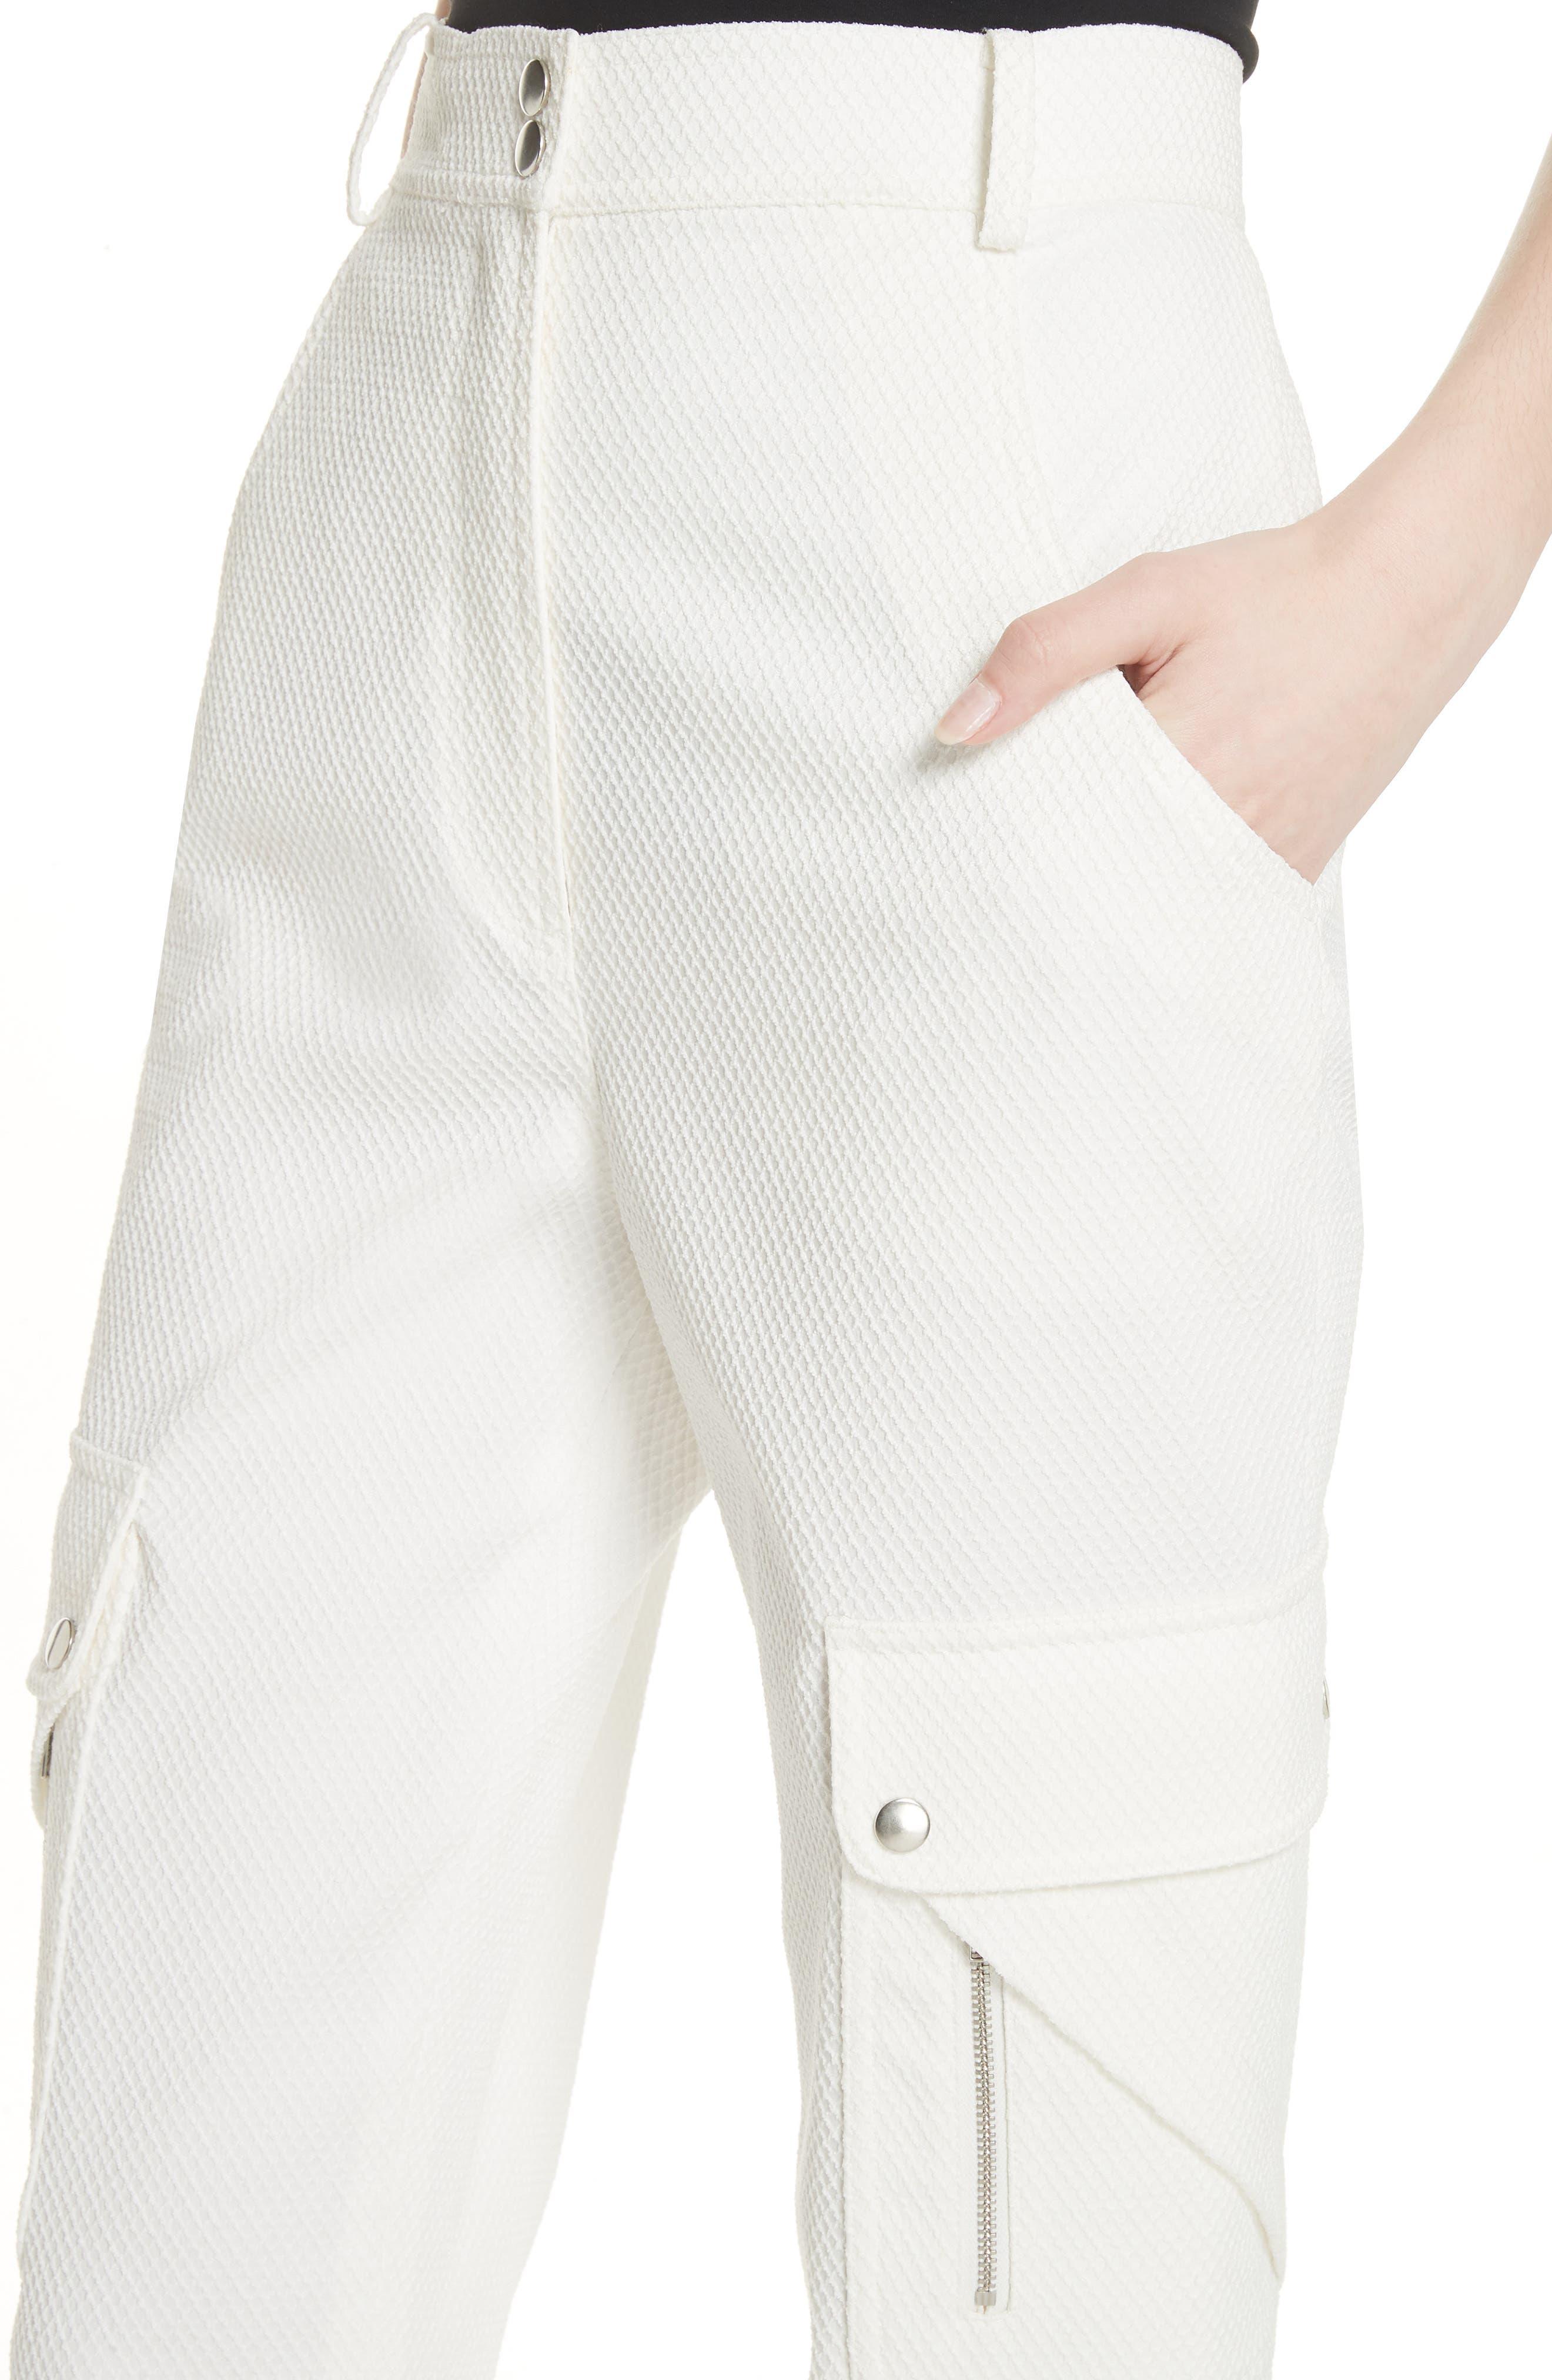 Textured Stretch Cotton Blend Utility Pants,                             Alternate thumbnail 4, color,                             Soft White